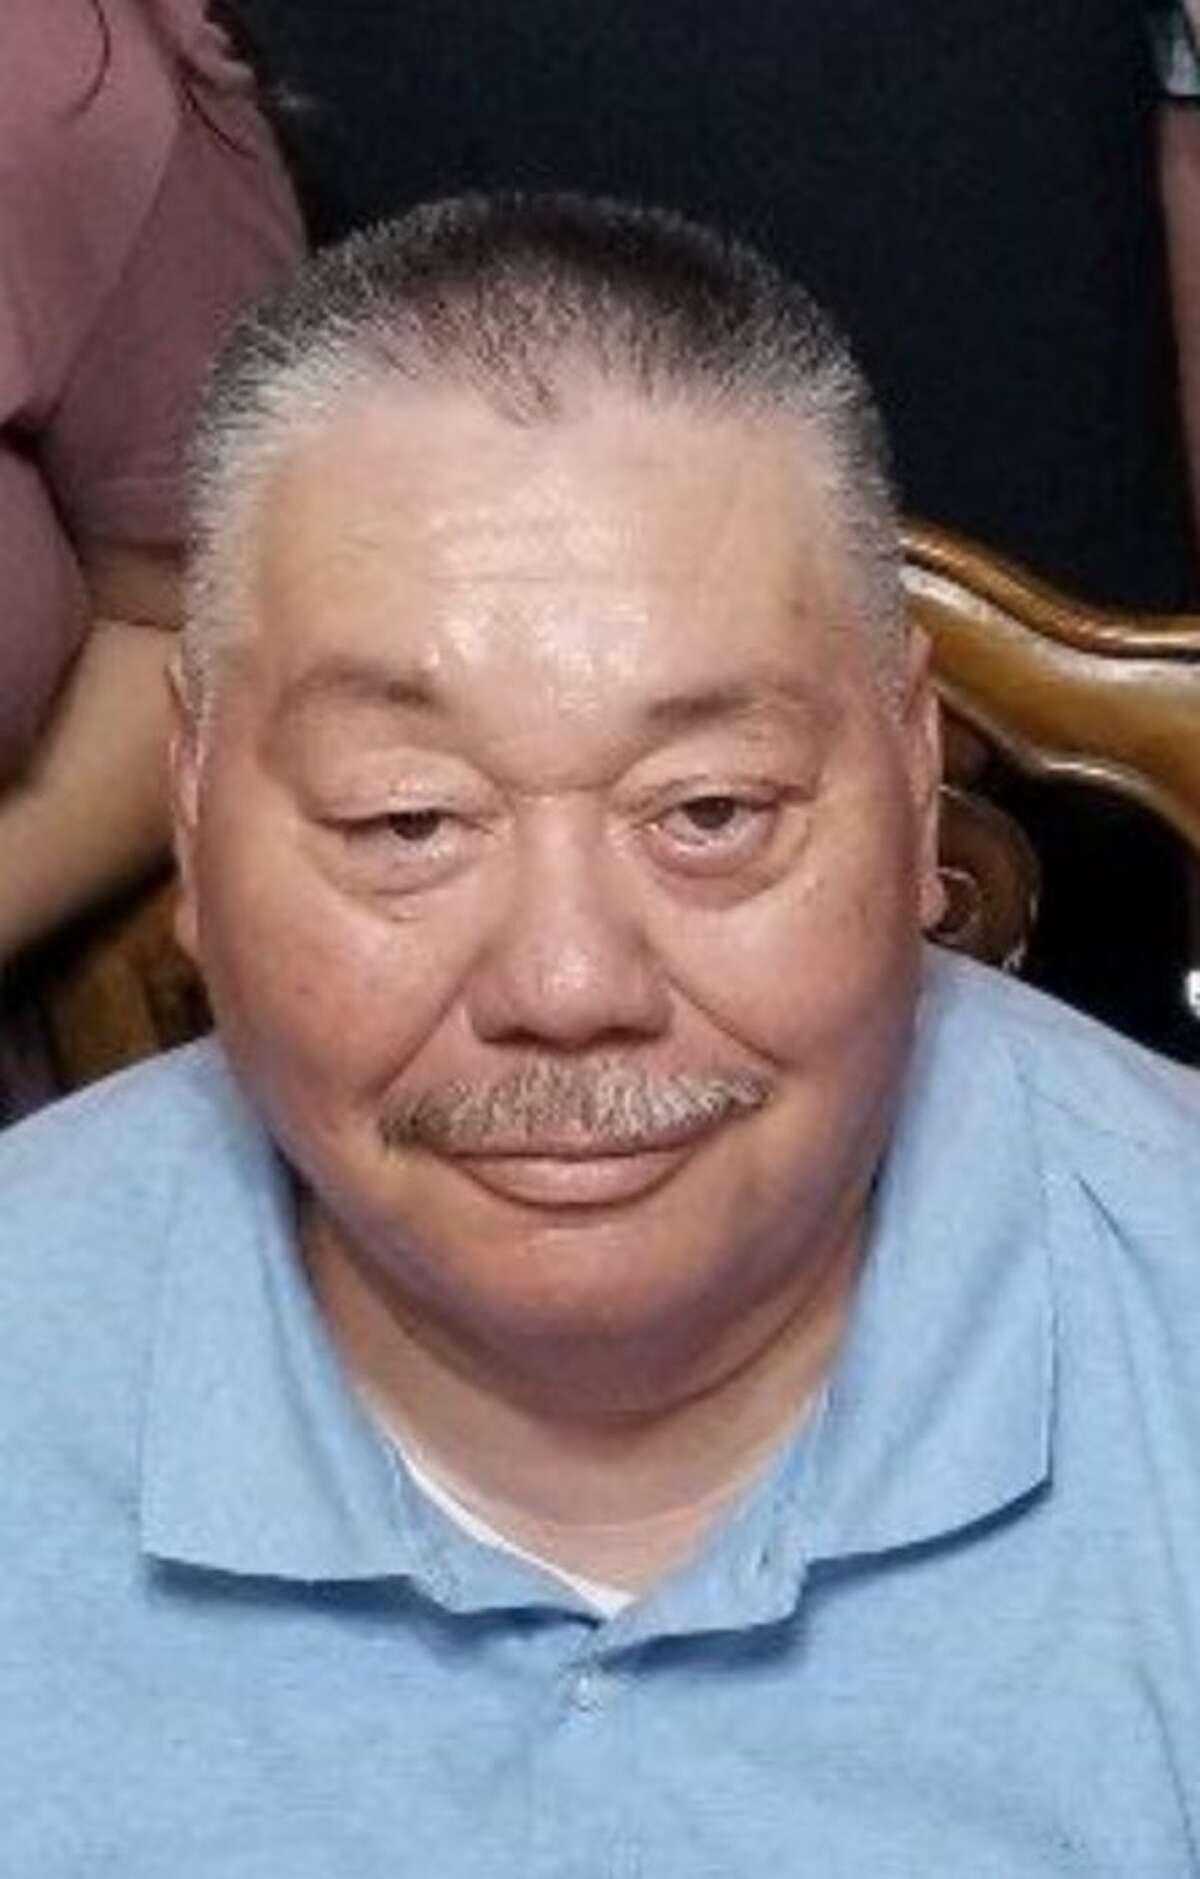 Jose Orta Juarez